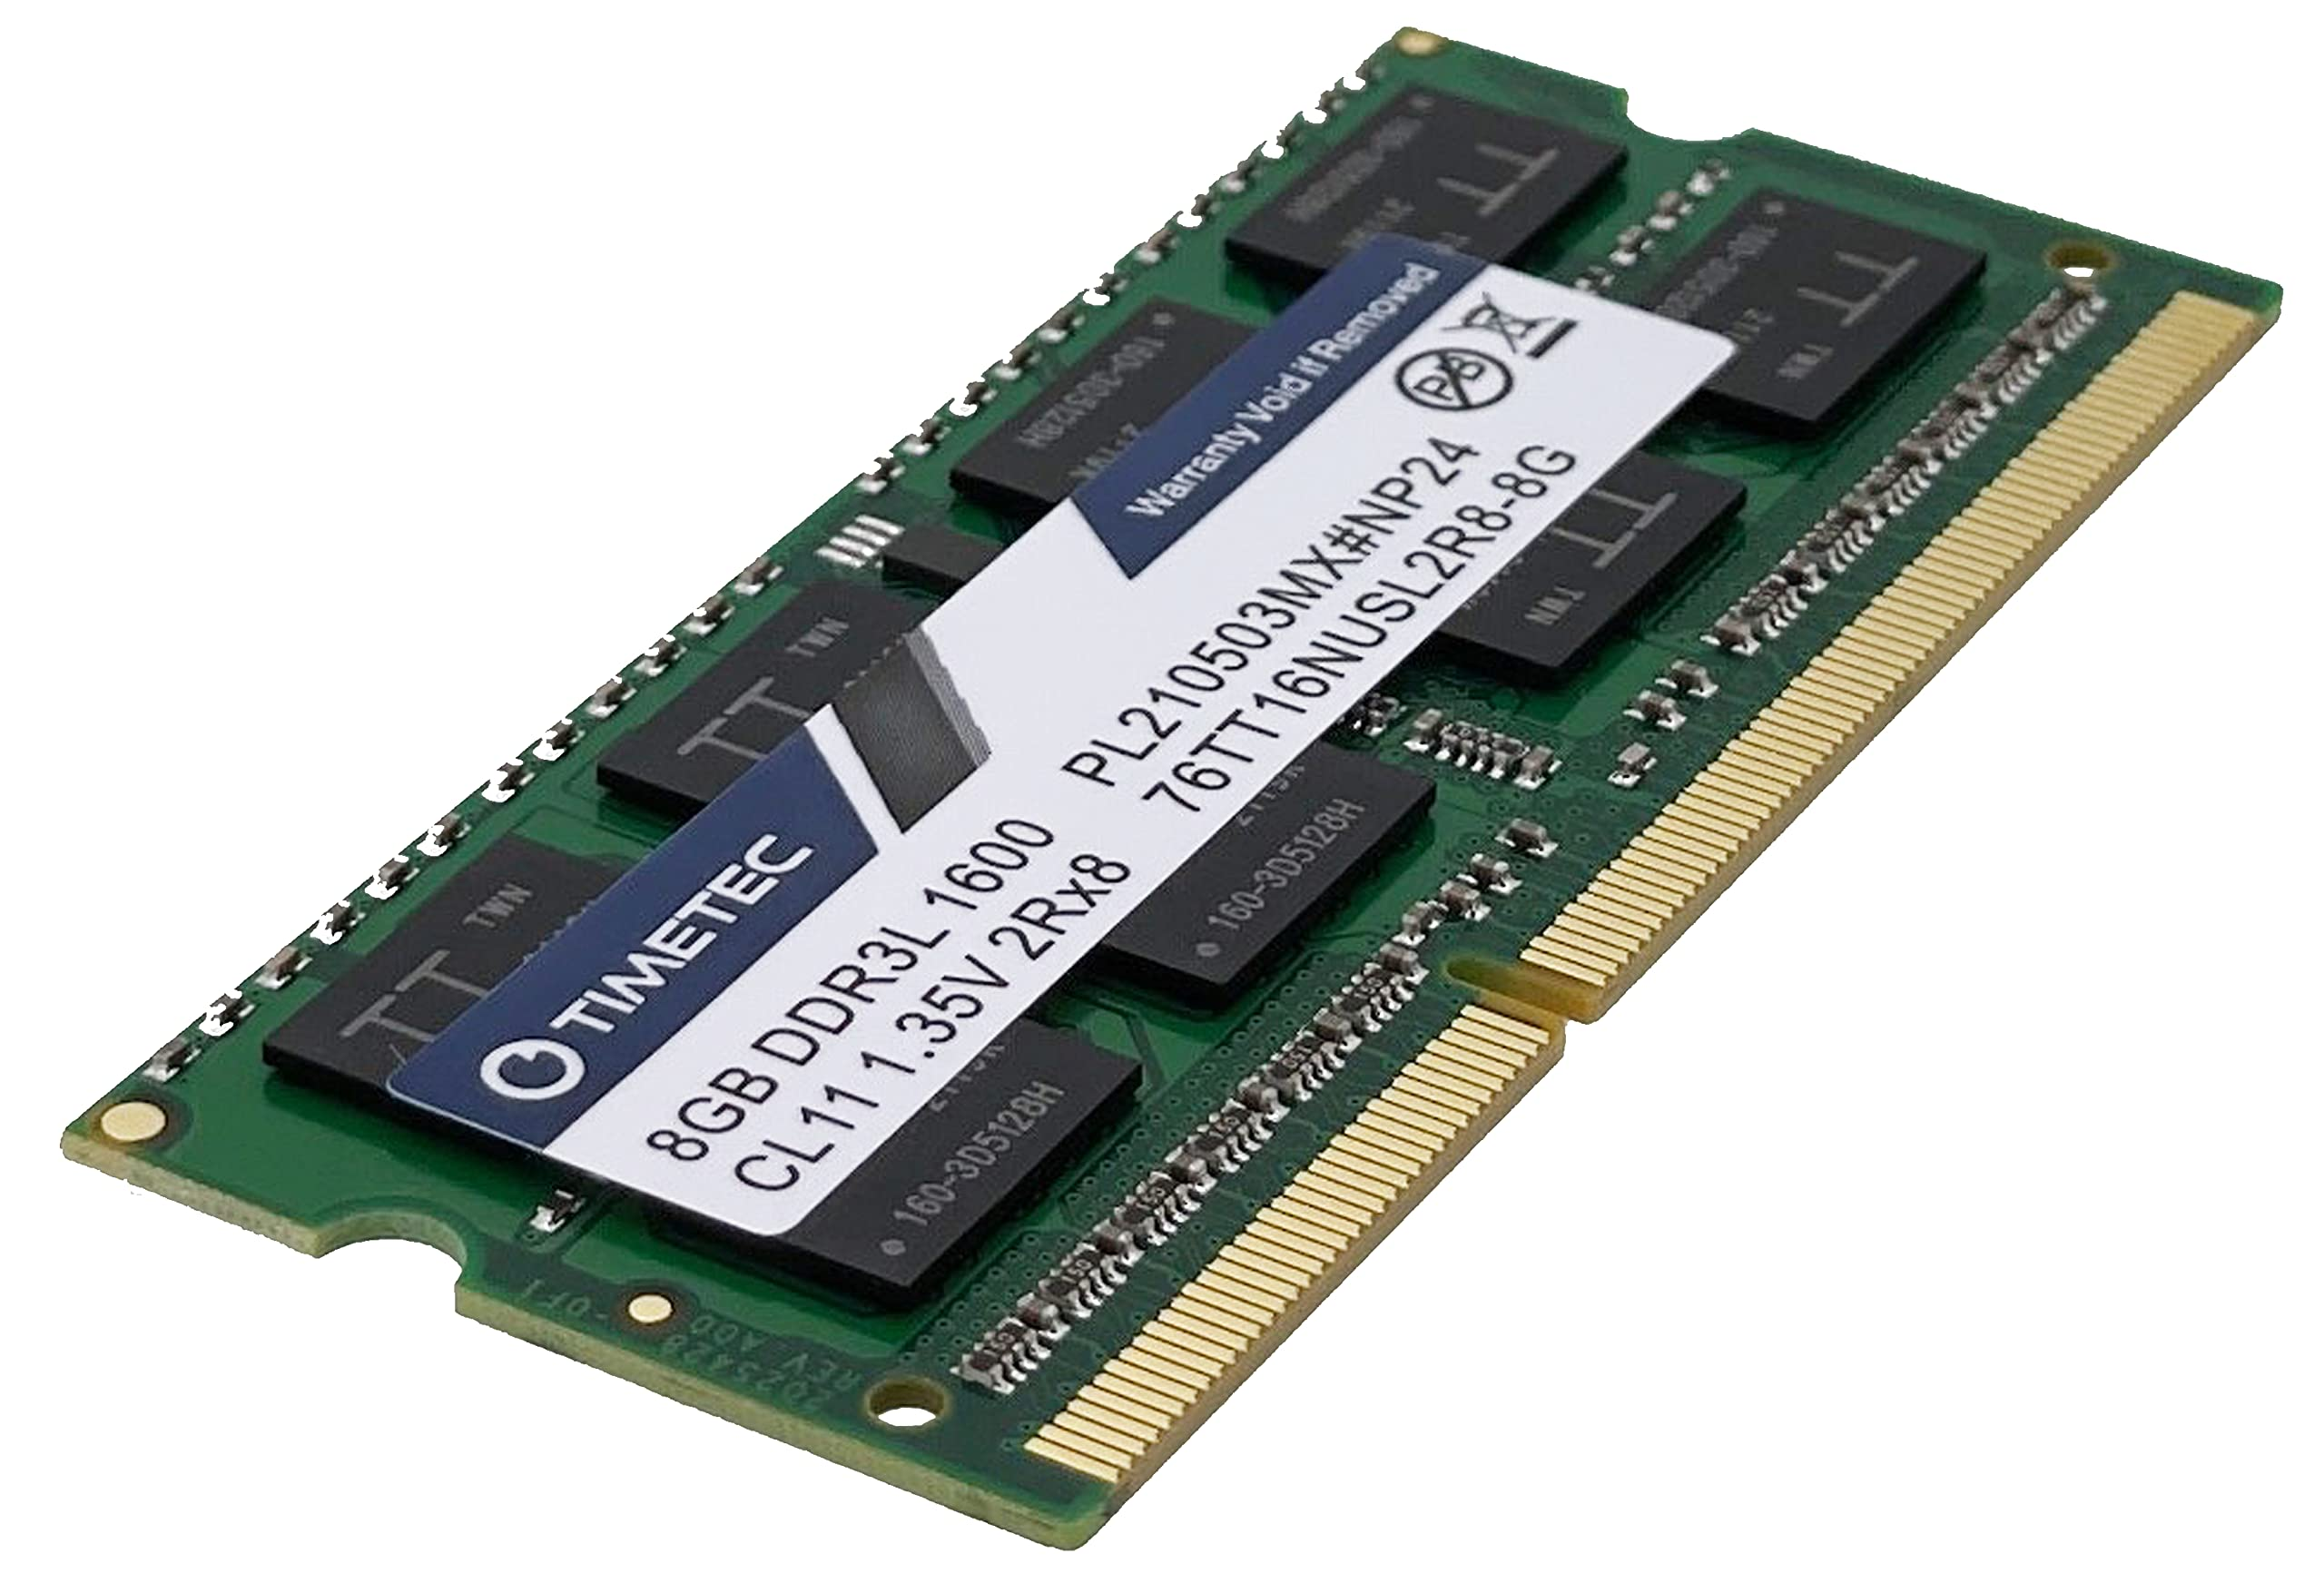 Timetec 8GB DDR3L / DDR3 1600MHz (DDR3L-1600) PC3L-12800 / PC3-12800(PC3L-12800S) Non-ECC Unbuffered 1.35V/1.5V CL11 2Rx8 Dual Rank 204 Pin SODIMM Laptop Notebook PC Computer Memory RAM Module Upgrade